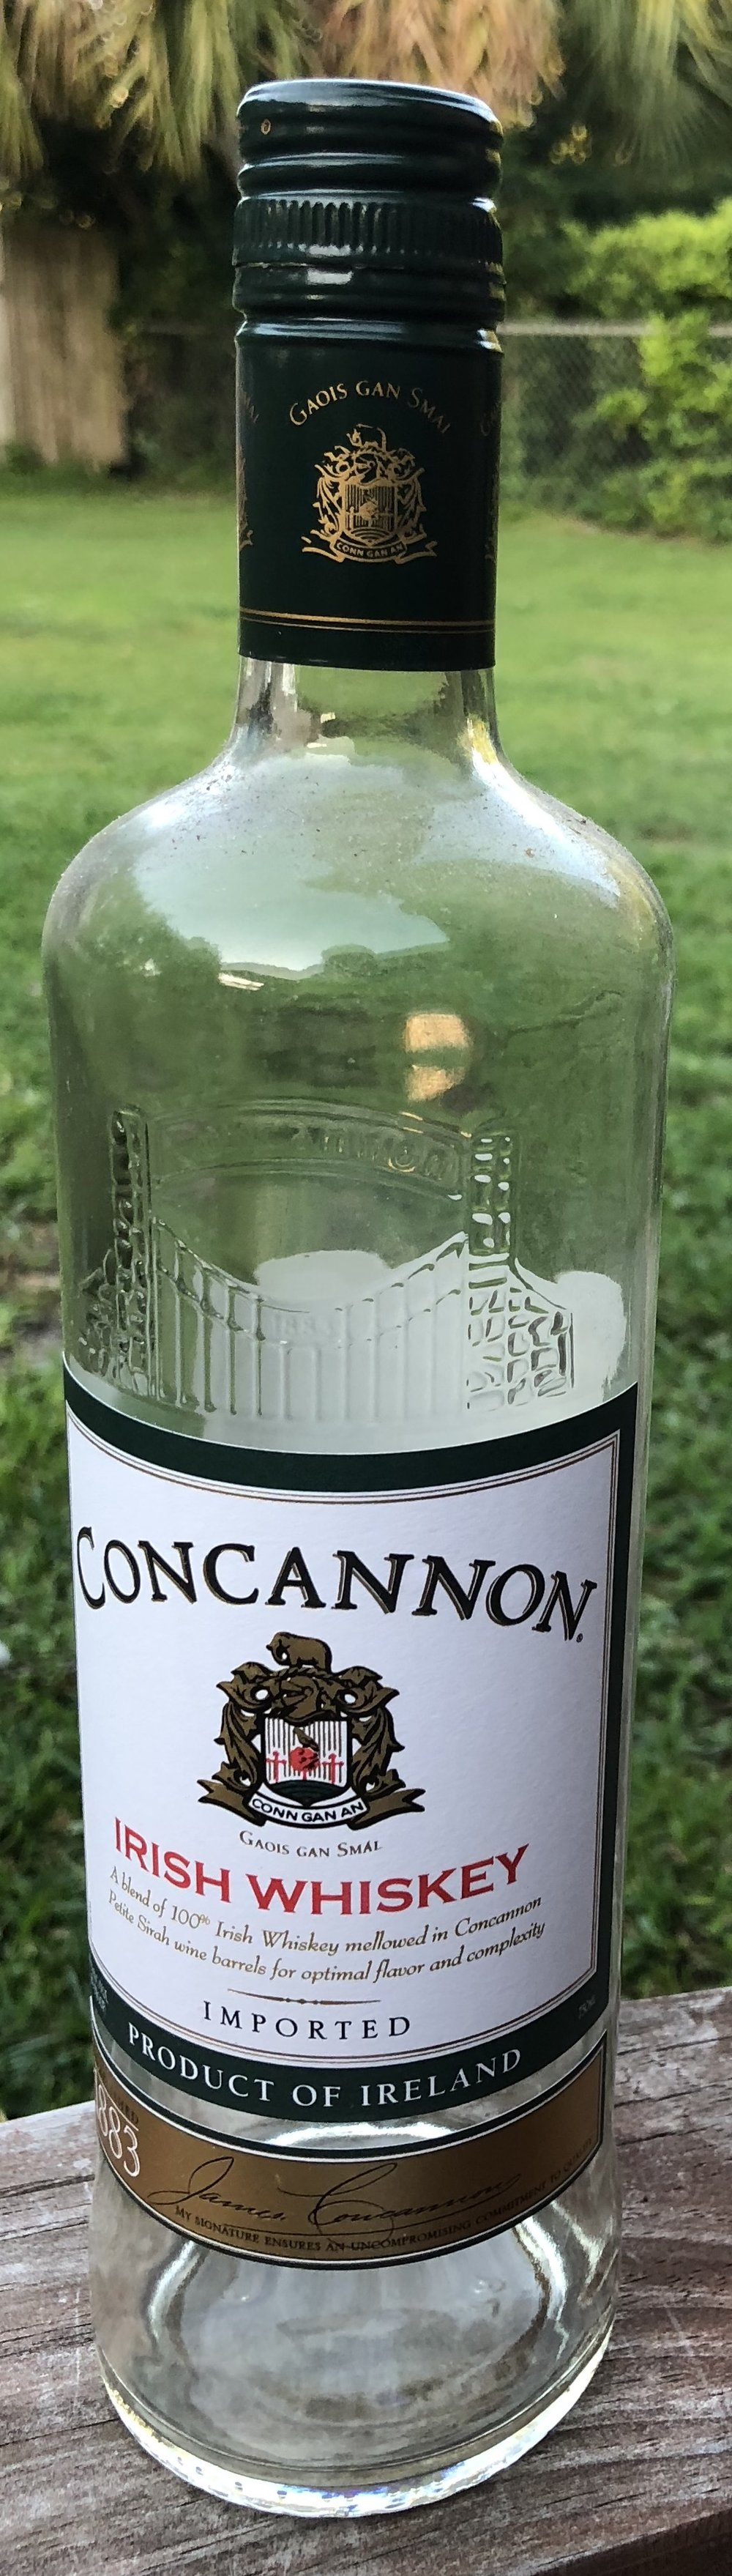 Concannon.jpg